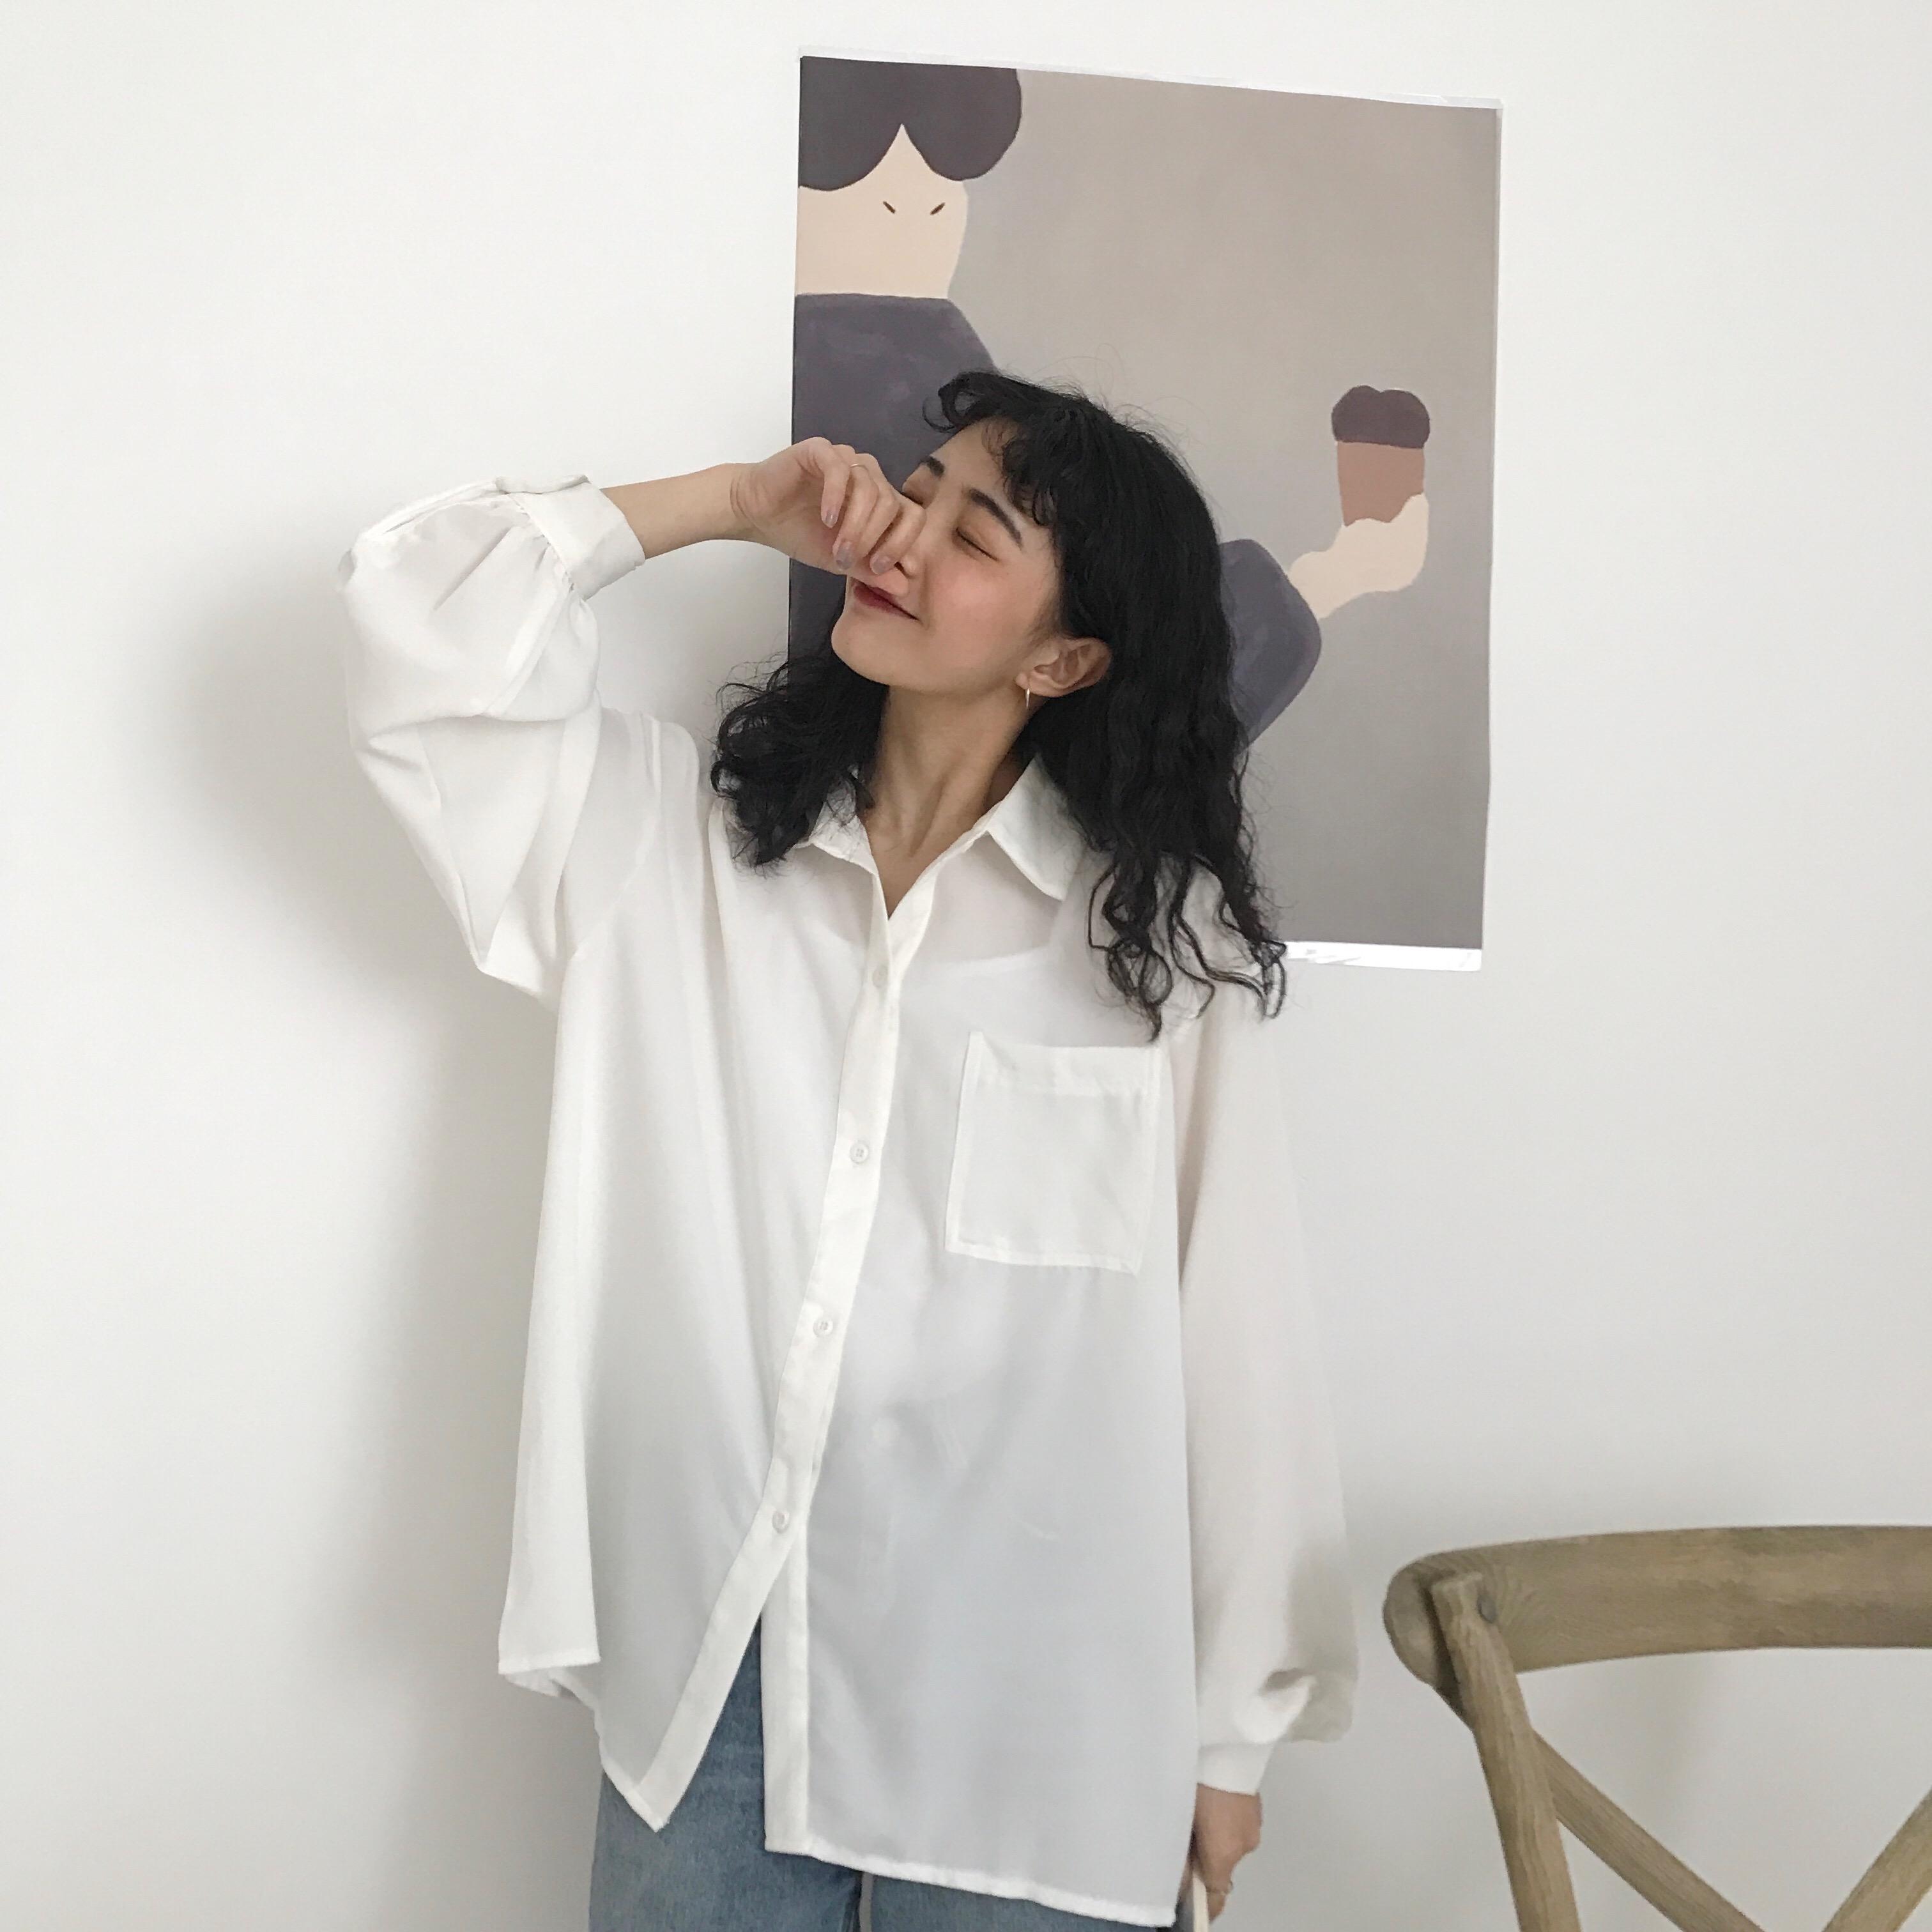 41a7c82e484 Women Summer Transparent Sexy White Shirts Abstract Cartoon Printed Pocket Lantern  Sleeve Shirt Elegant Female Casual Tops Blusa